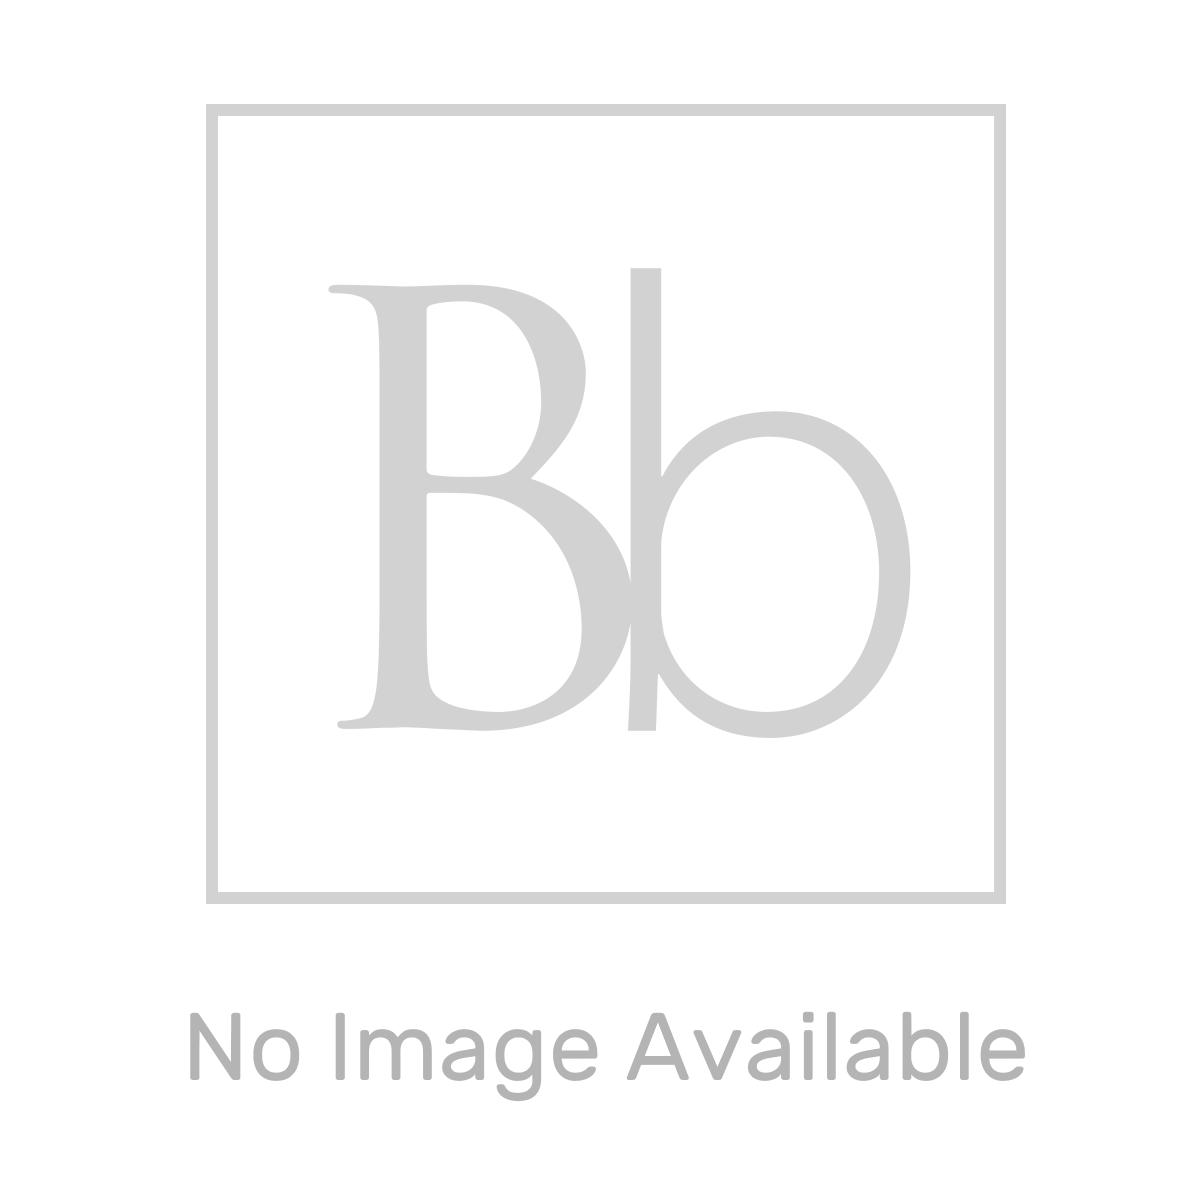 Aquadart White Slate Shower Tray 1500 x 900